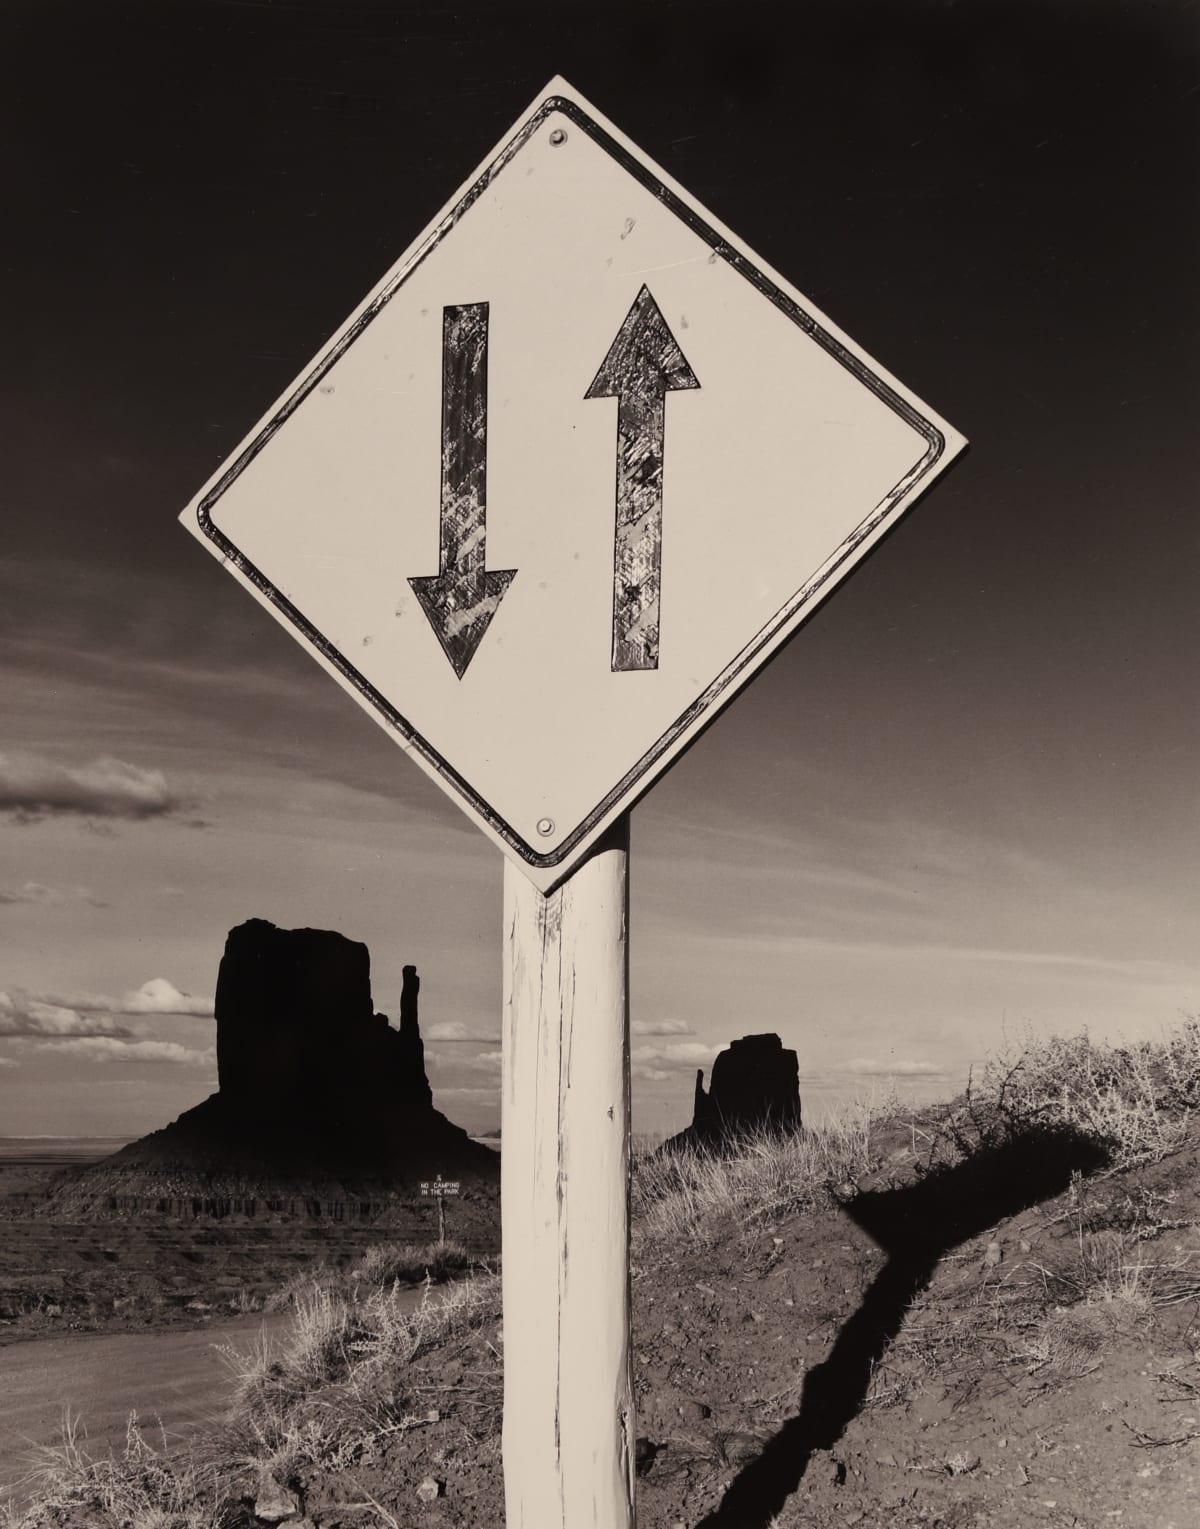 Bob Kolbrener, Arrows, Monument Valley, 1980